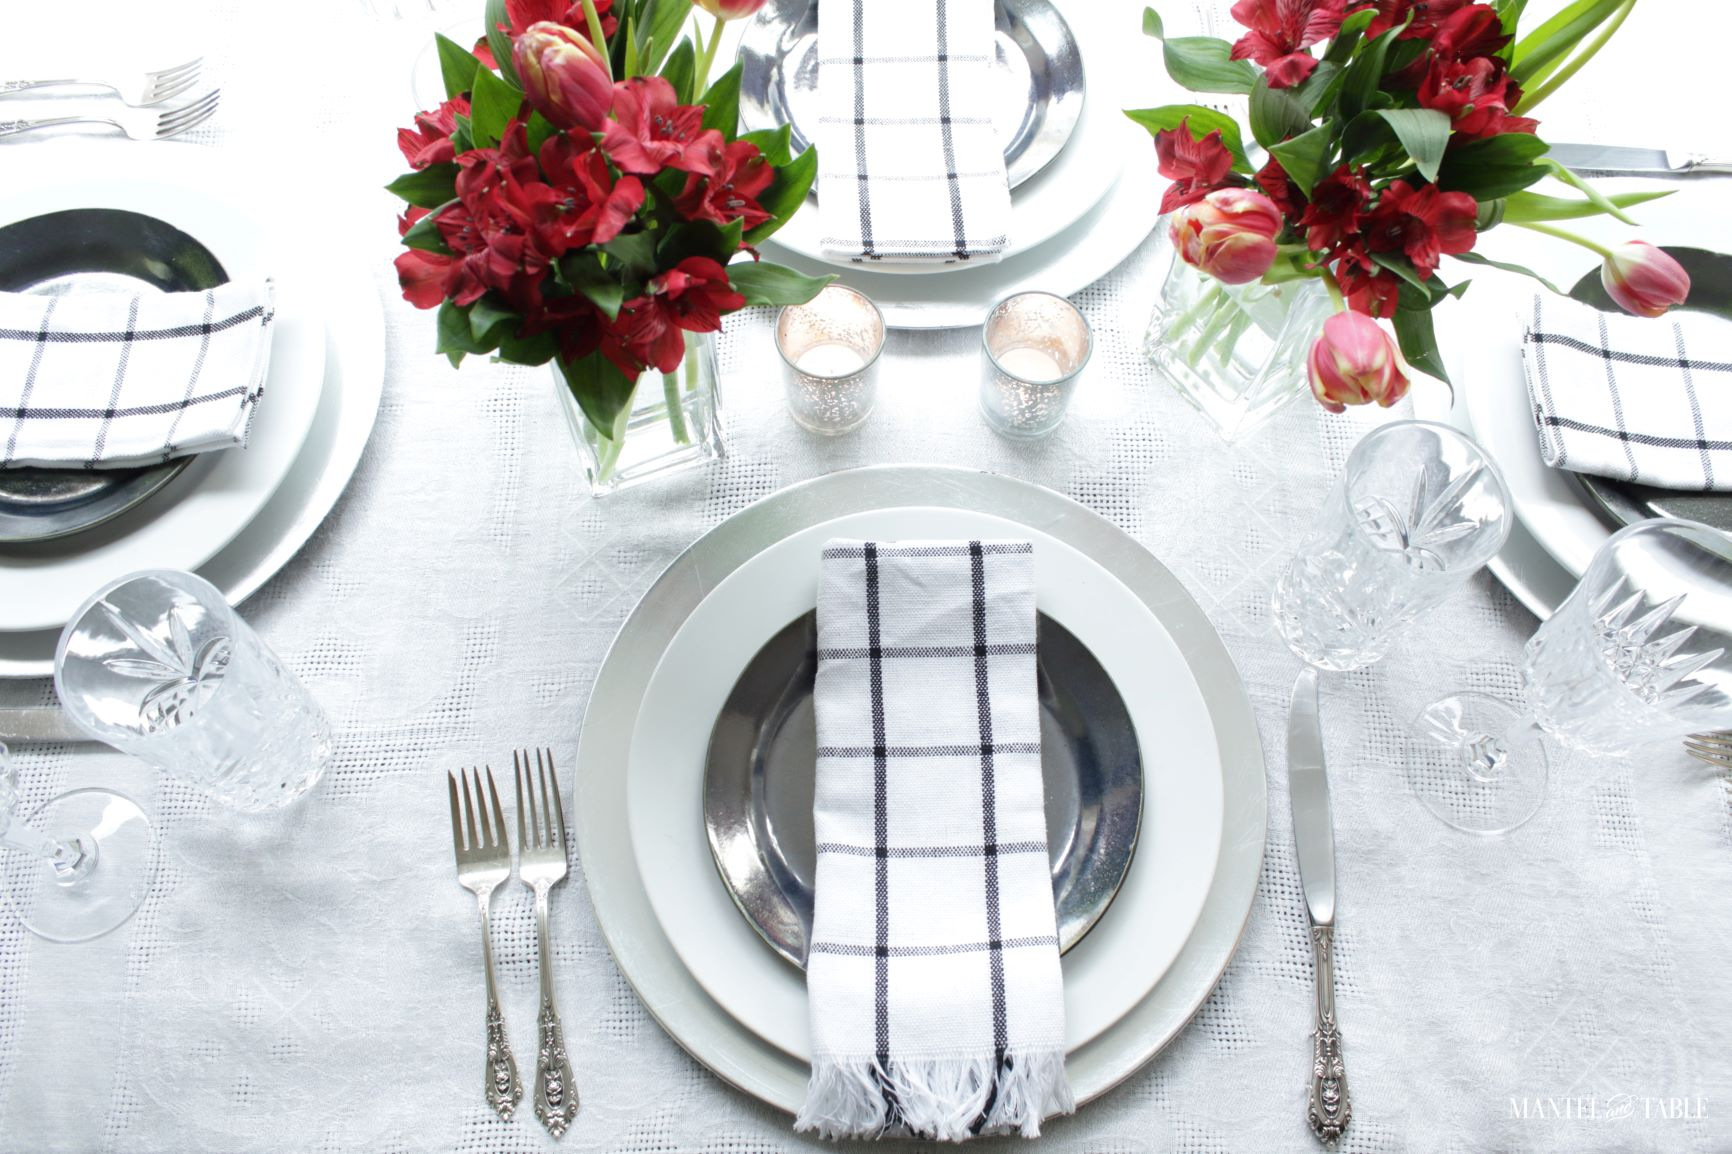 Elegant Spring Picnic tablescape top view